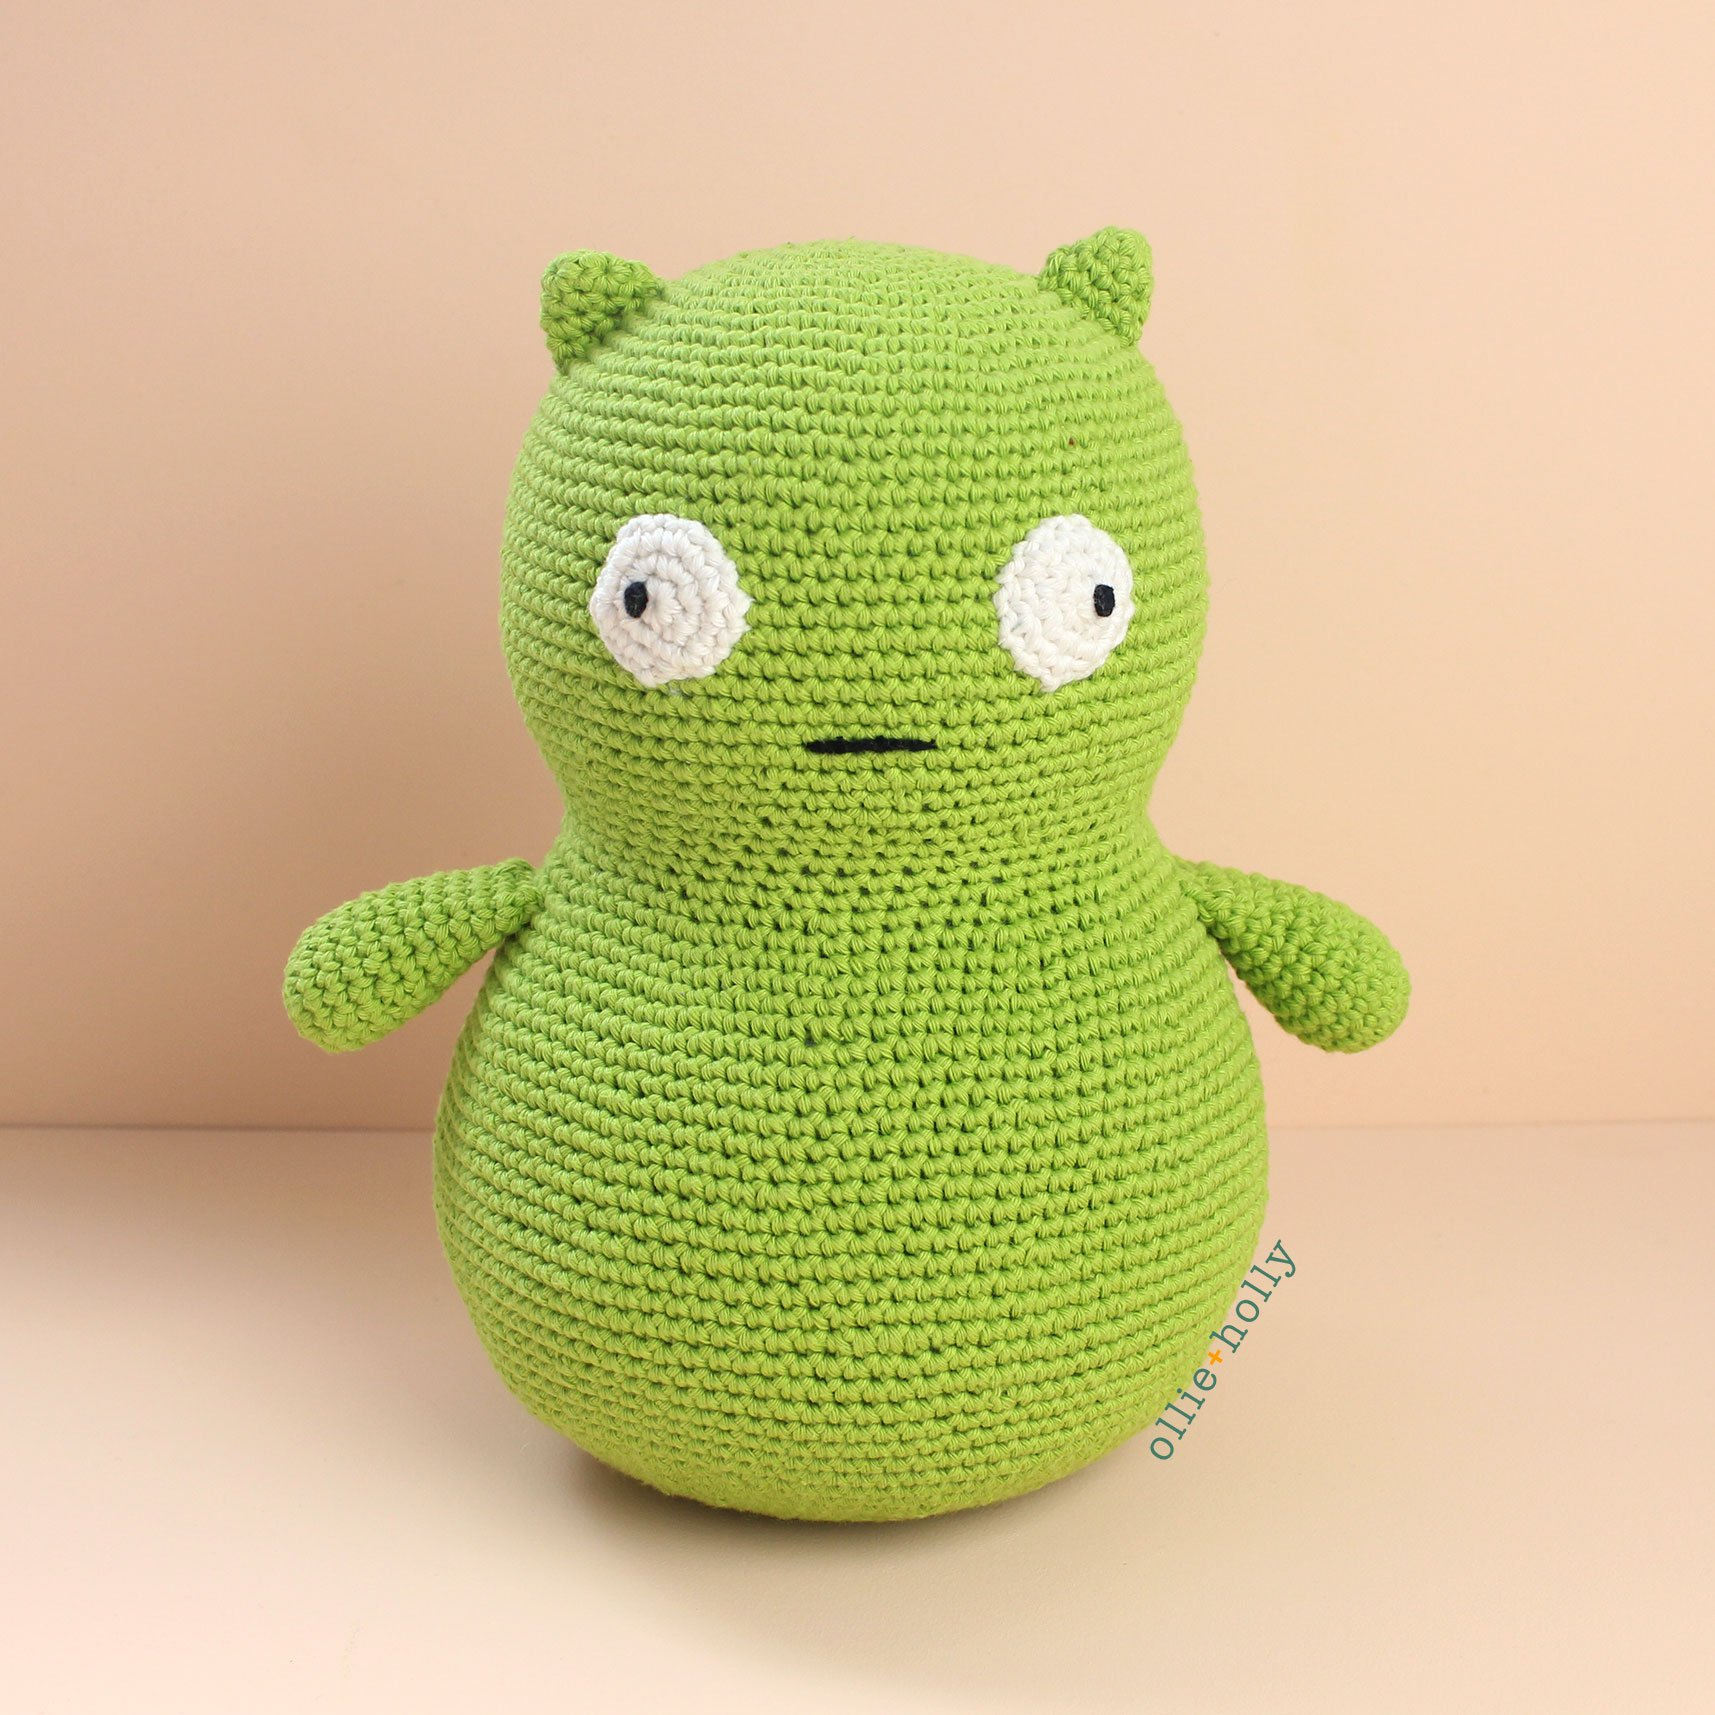 Kuchi Kopi from Bob's Burgers Amigurumi Crochet (Pattern Only)